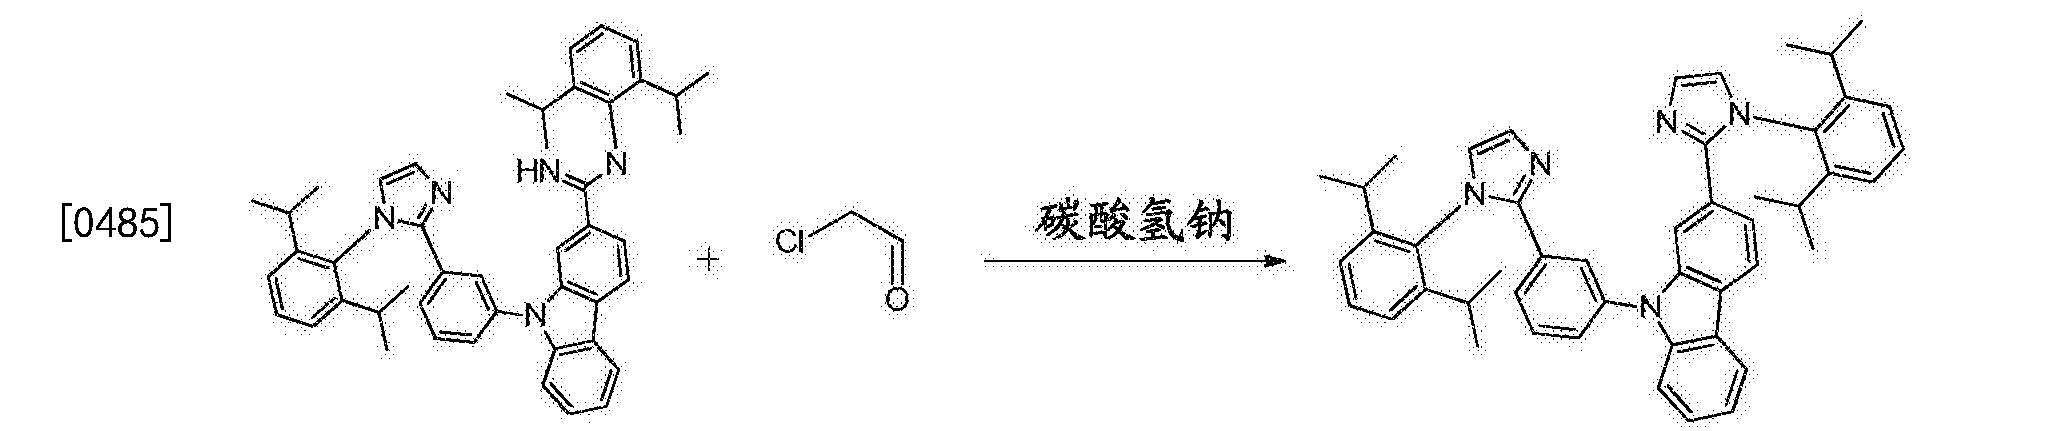 Figure CN106749425AD01491